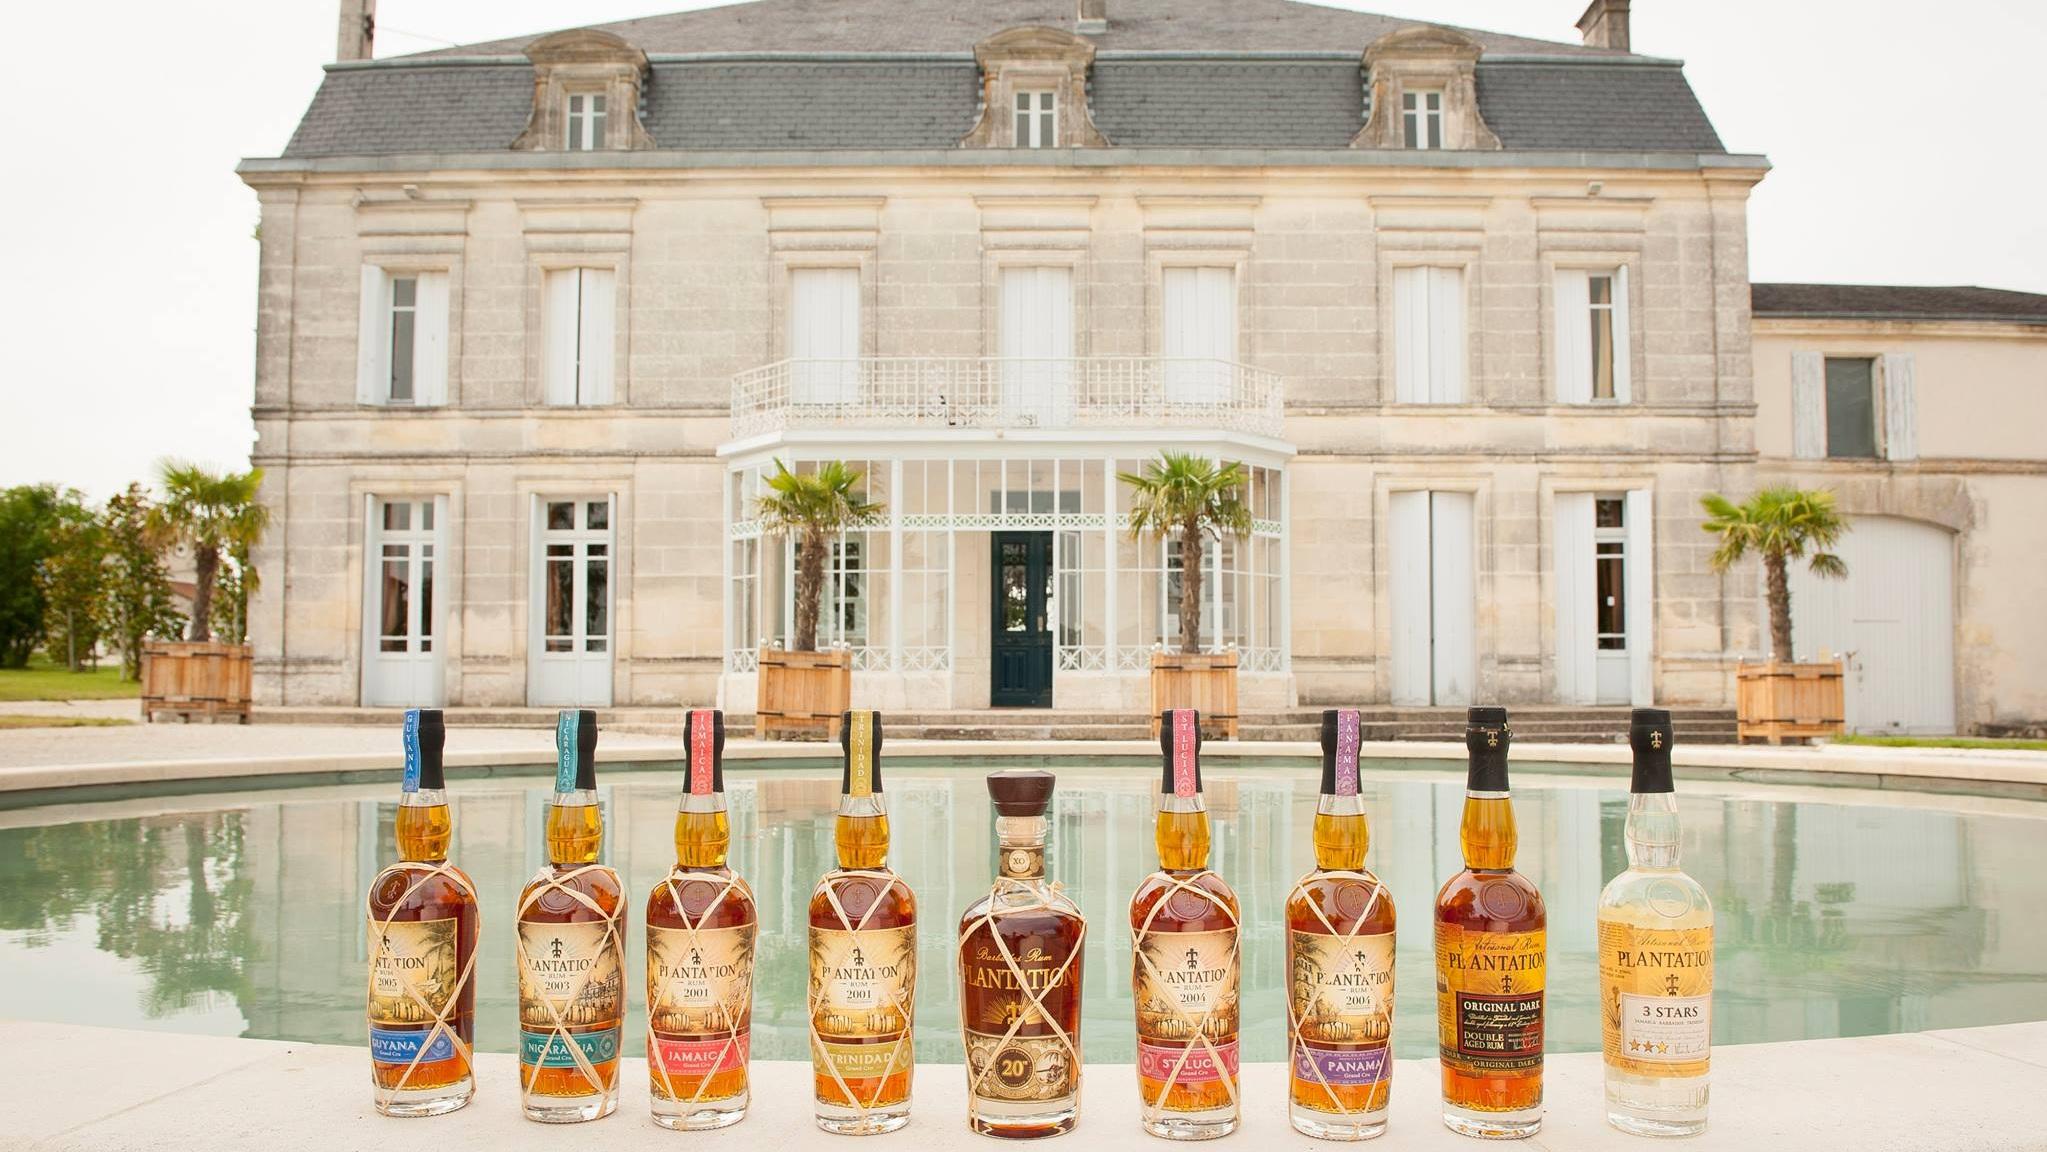 PLANTATION RUM - Rum finished in oak casks at the Maison Ferrand estate France.